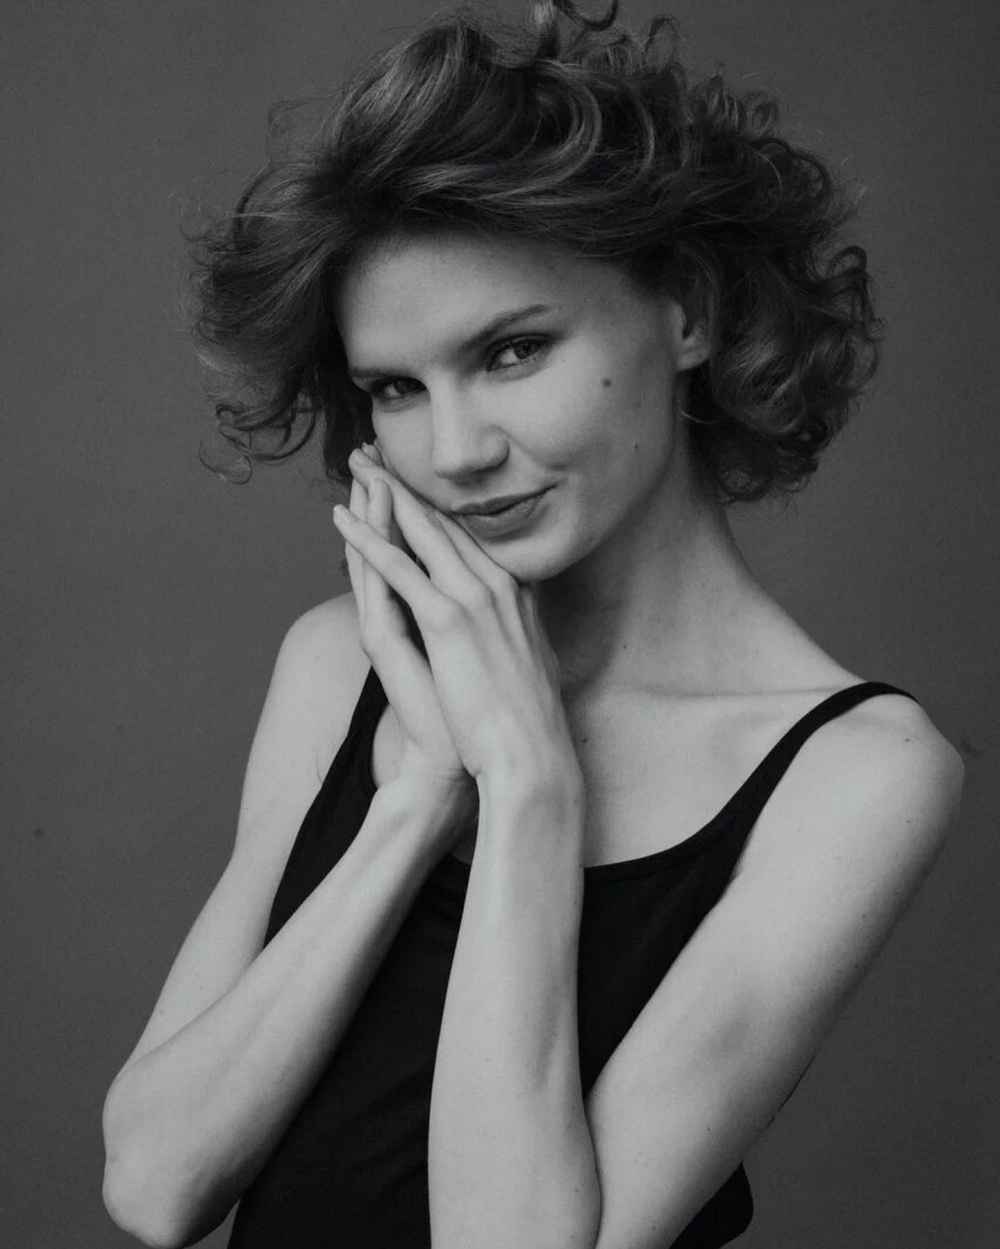 Фото: Юлия Джулай / Кадр из «Юлия Джулай» (1994) #3525365